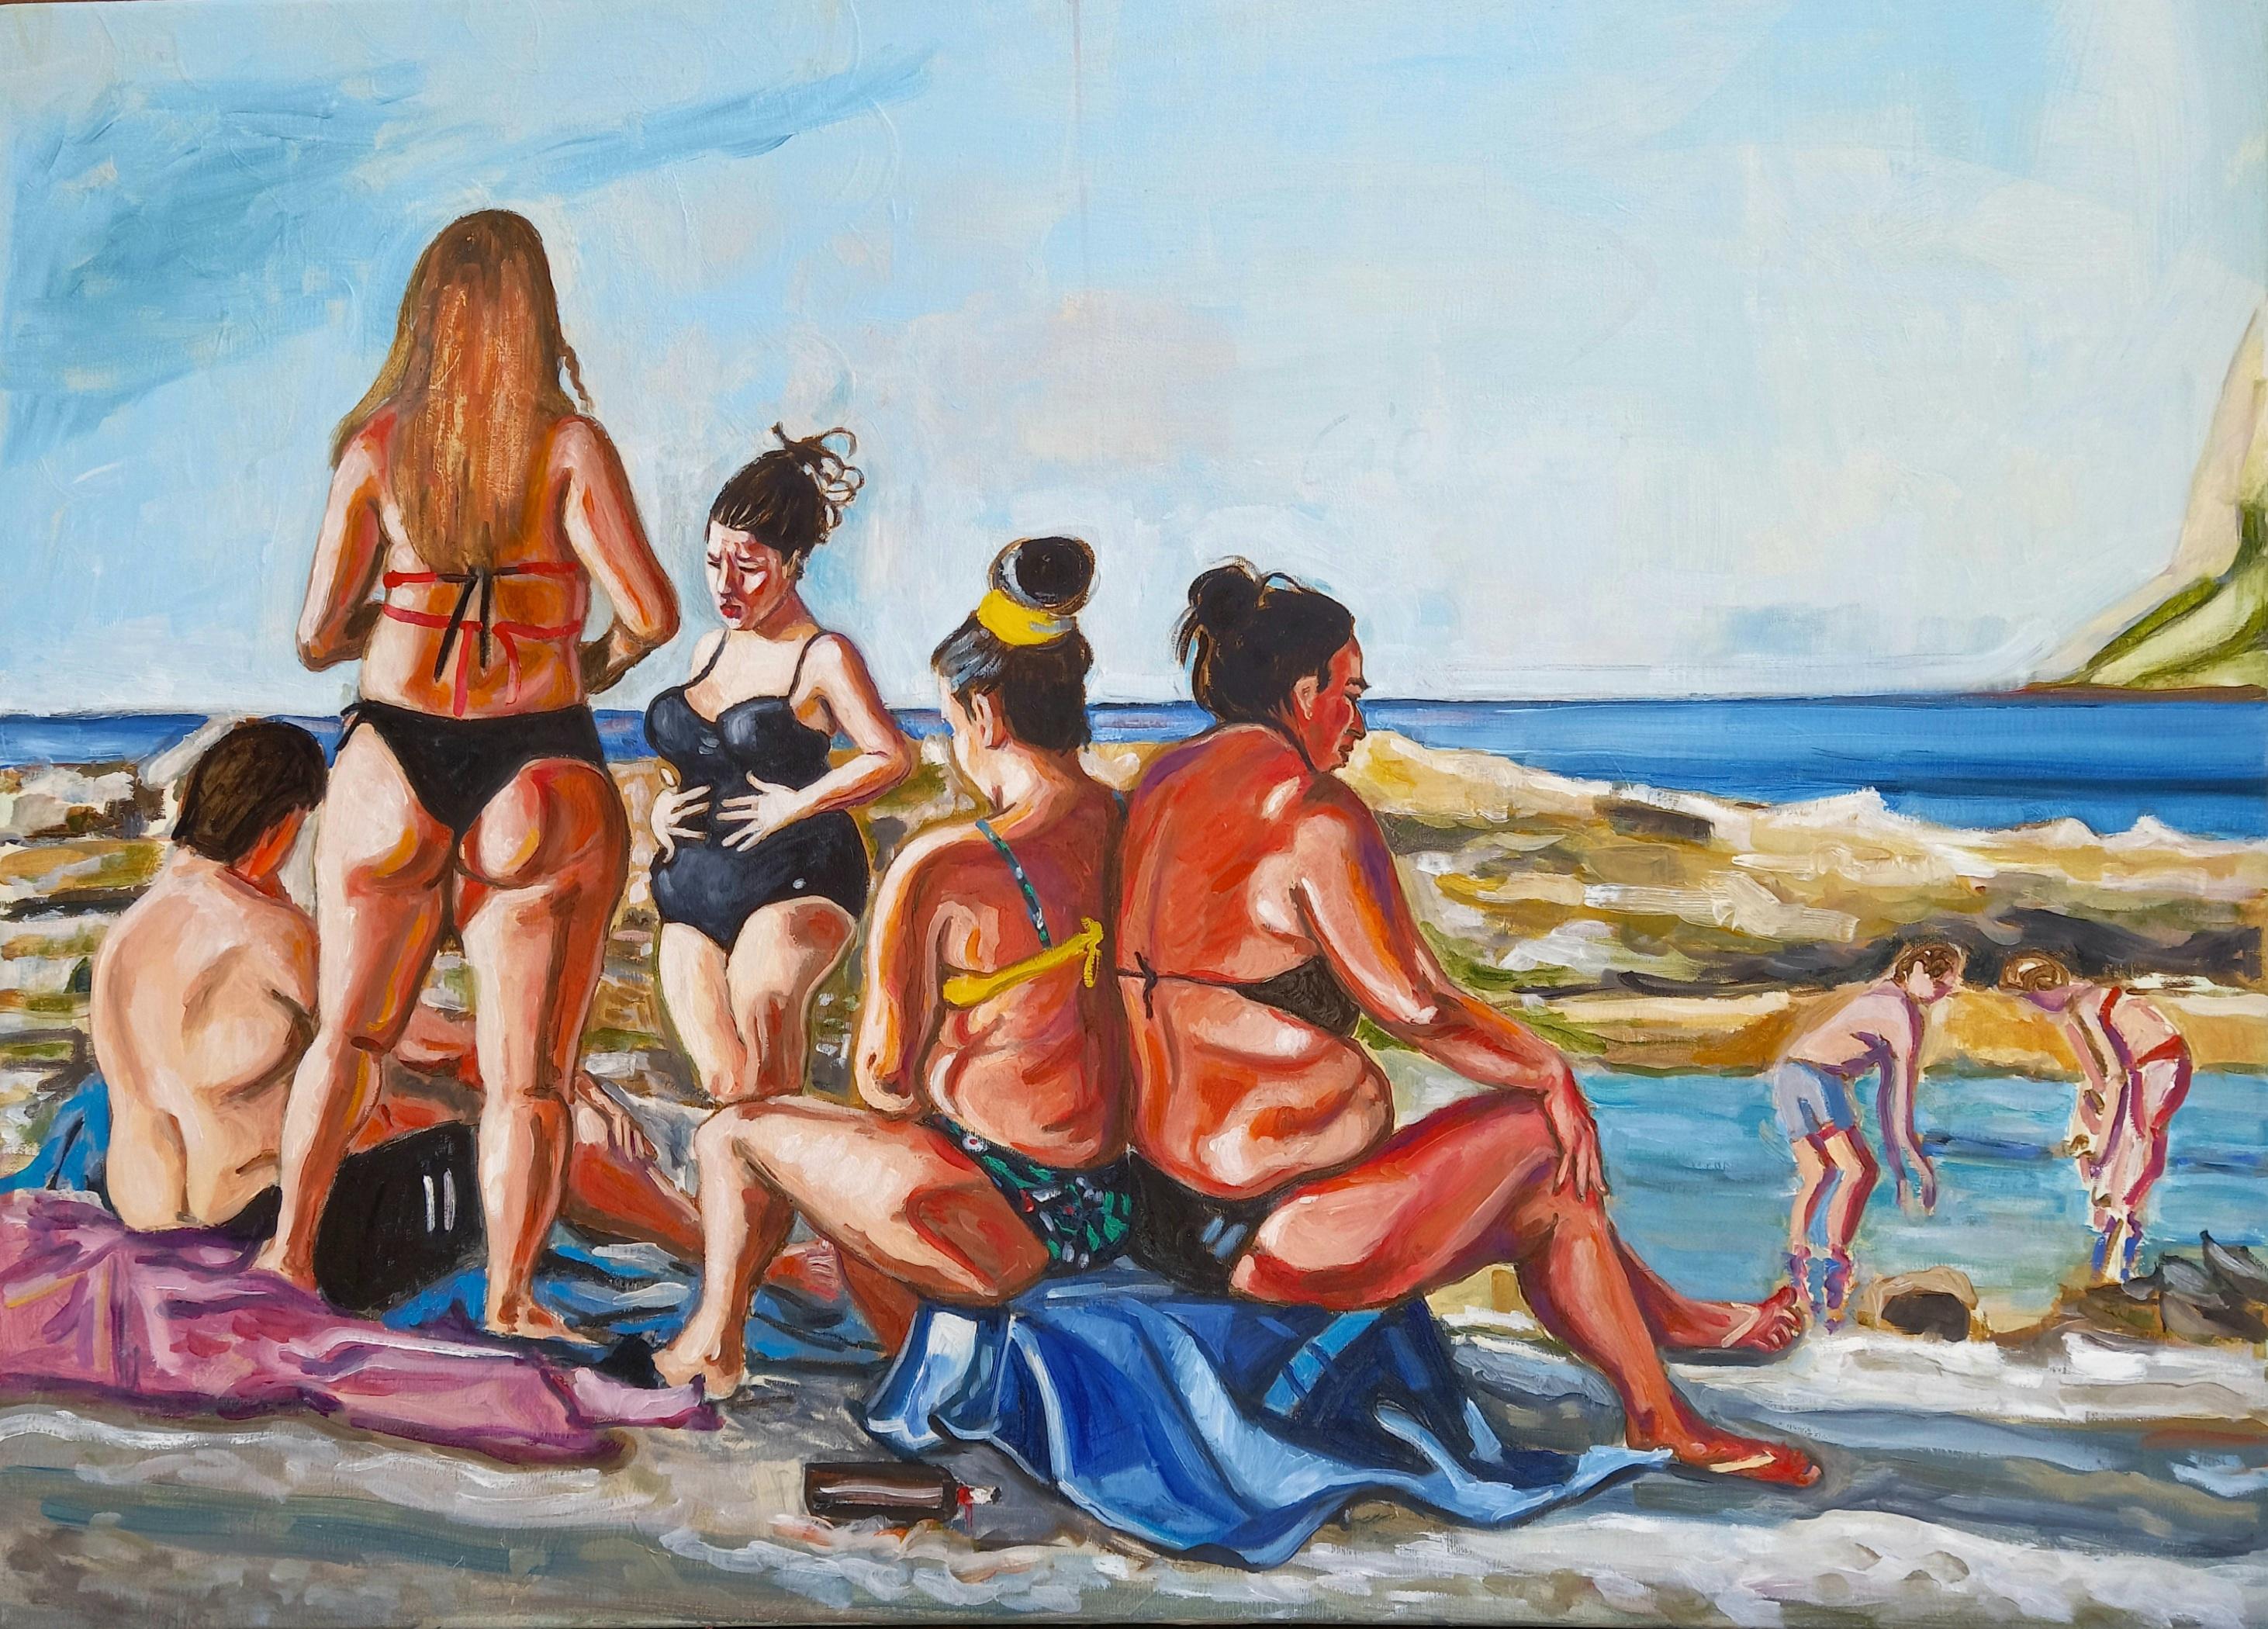 Barcarello, 70 cm x 100 cm , oil on canvas, 2021